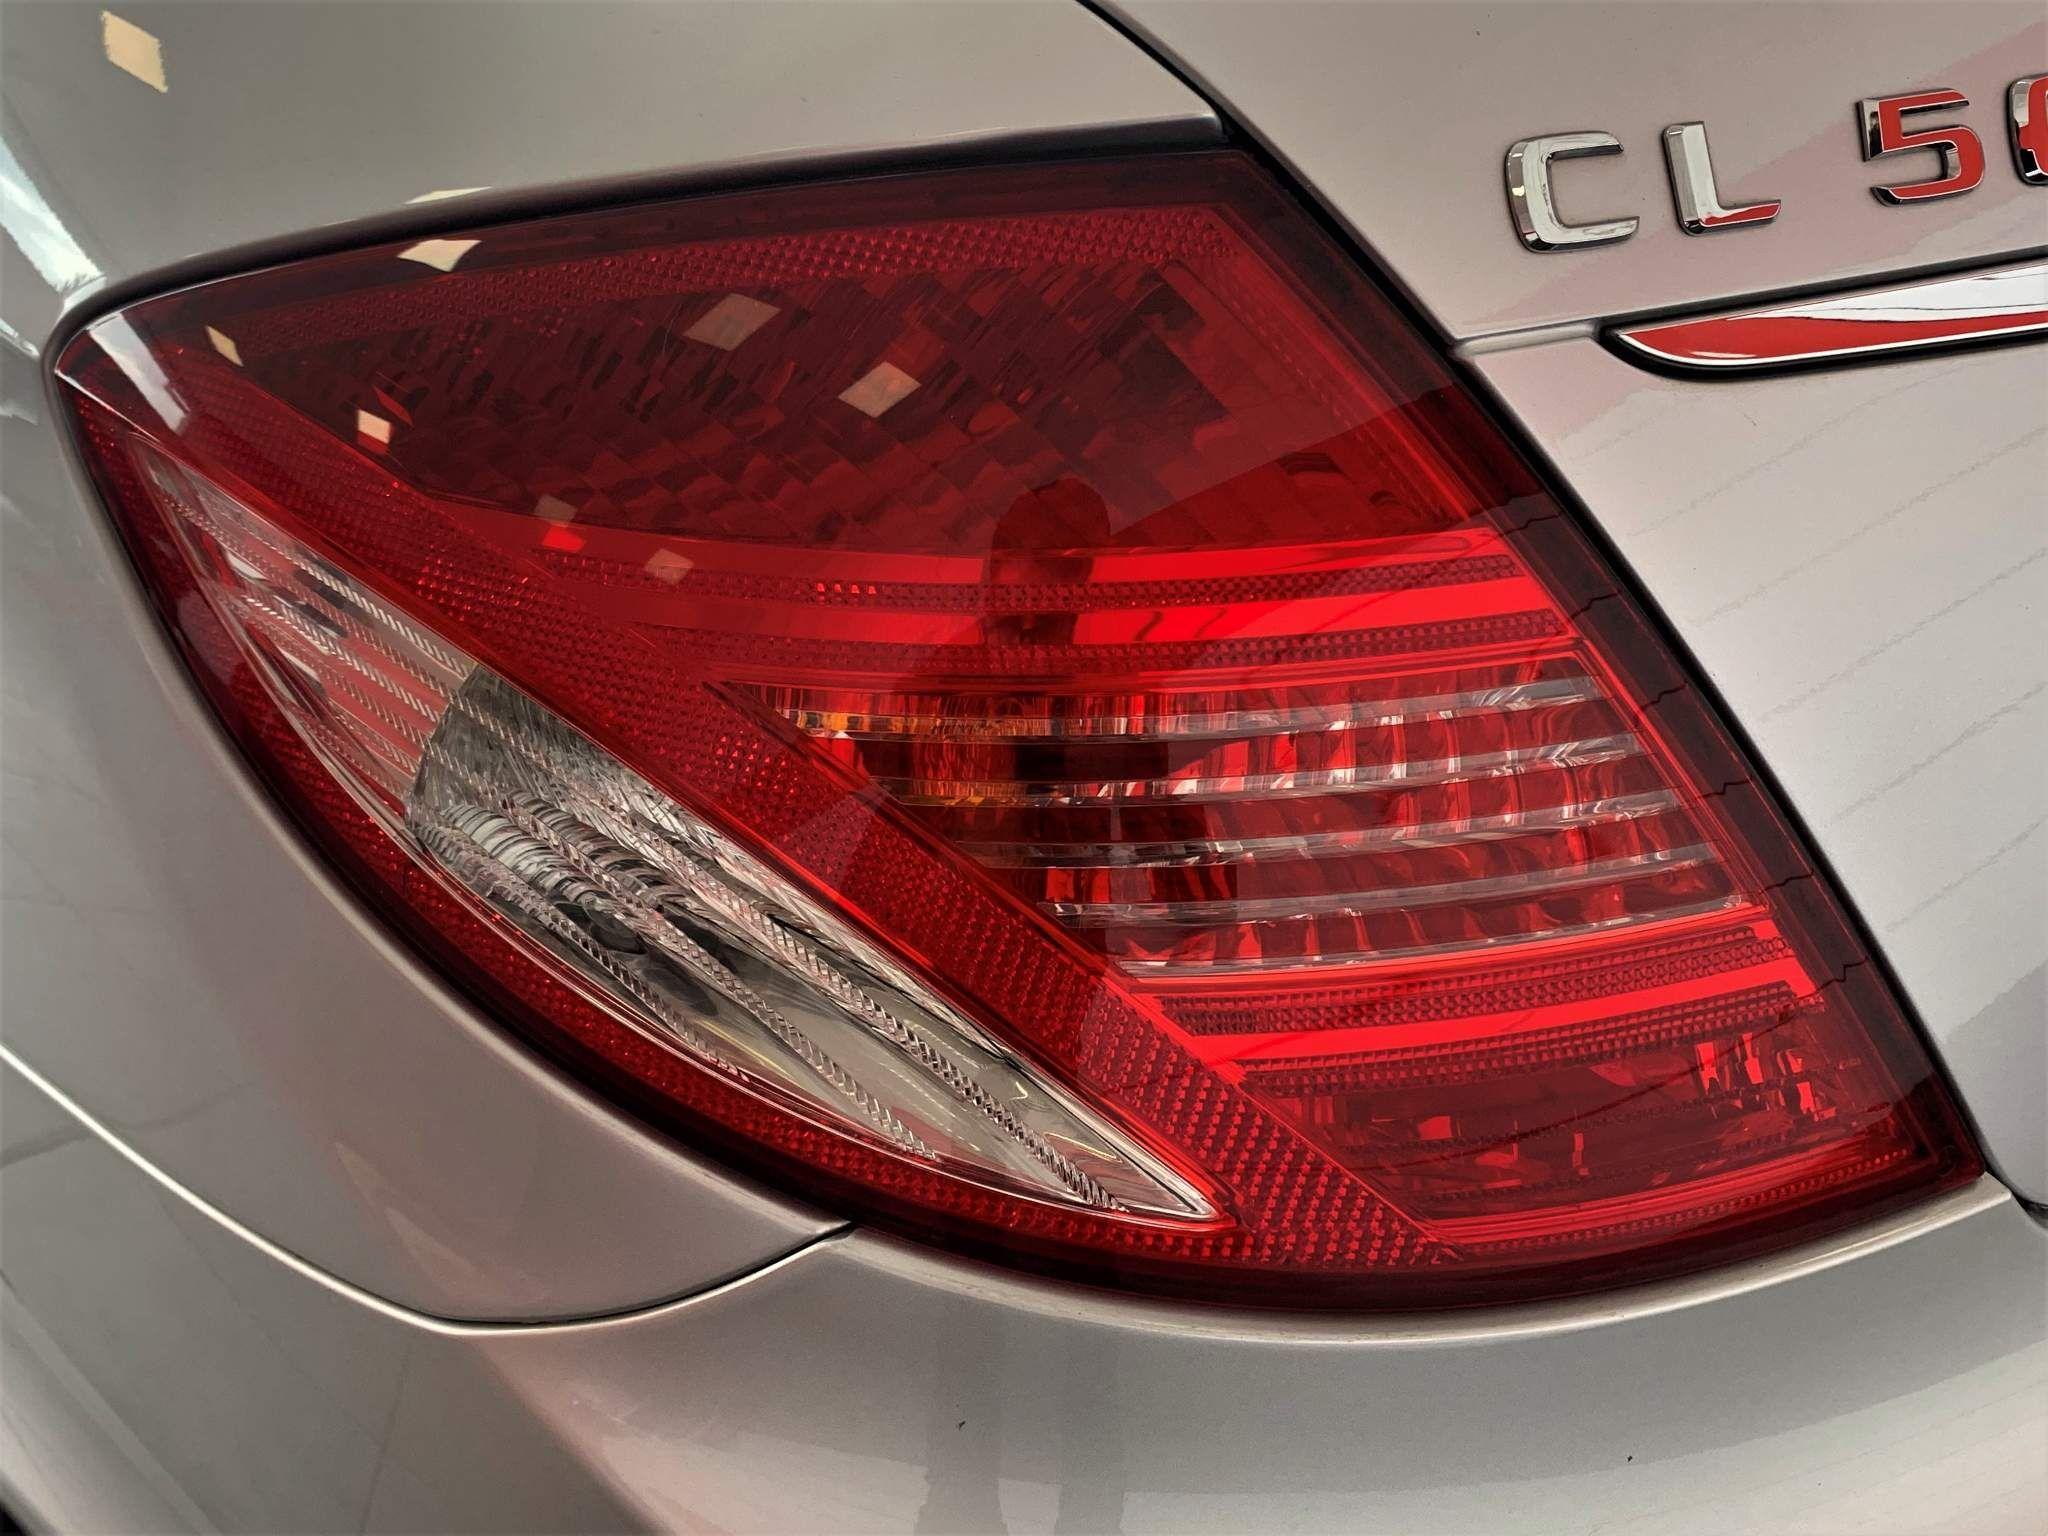 Mercedes-Benz CL Images